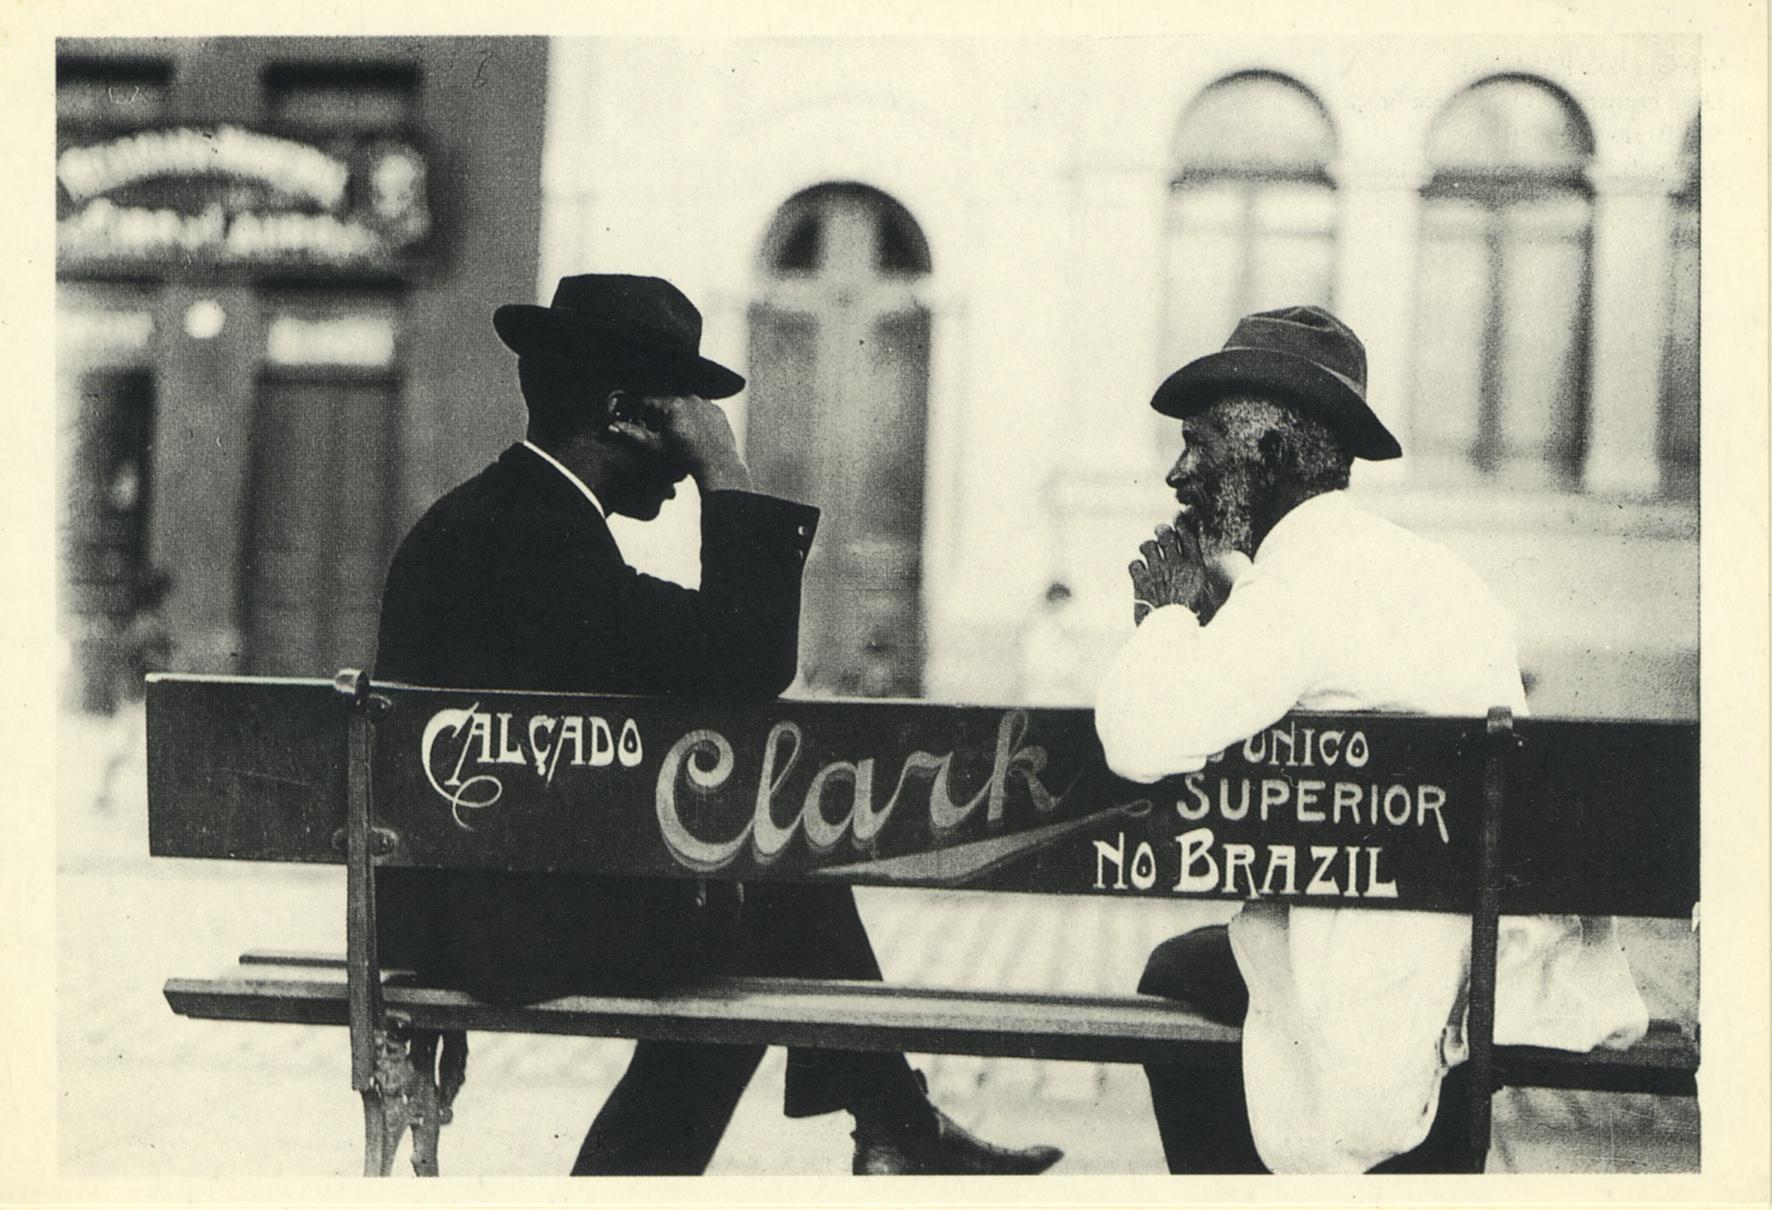 Clark's Brazil